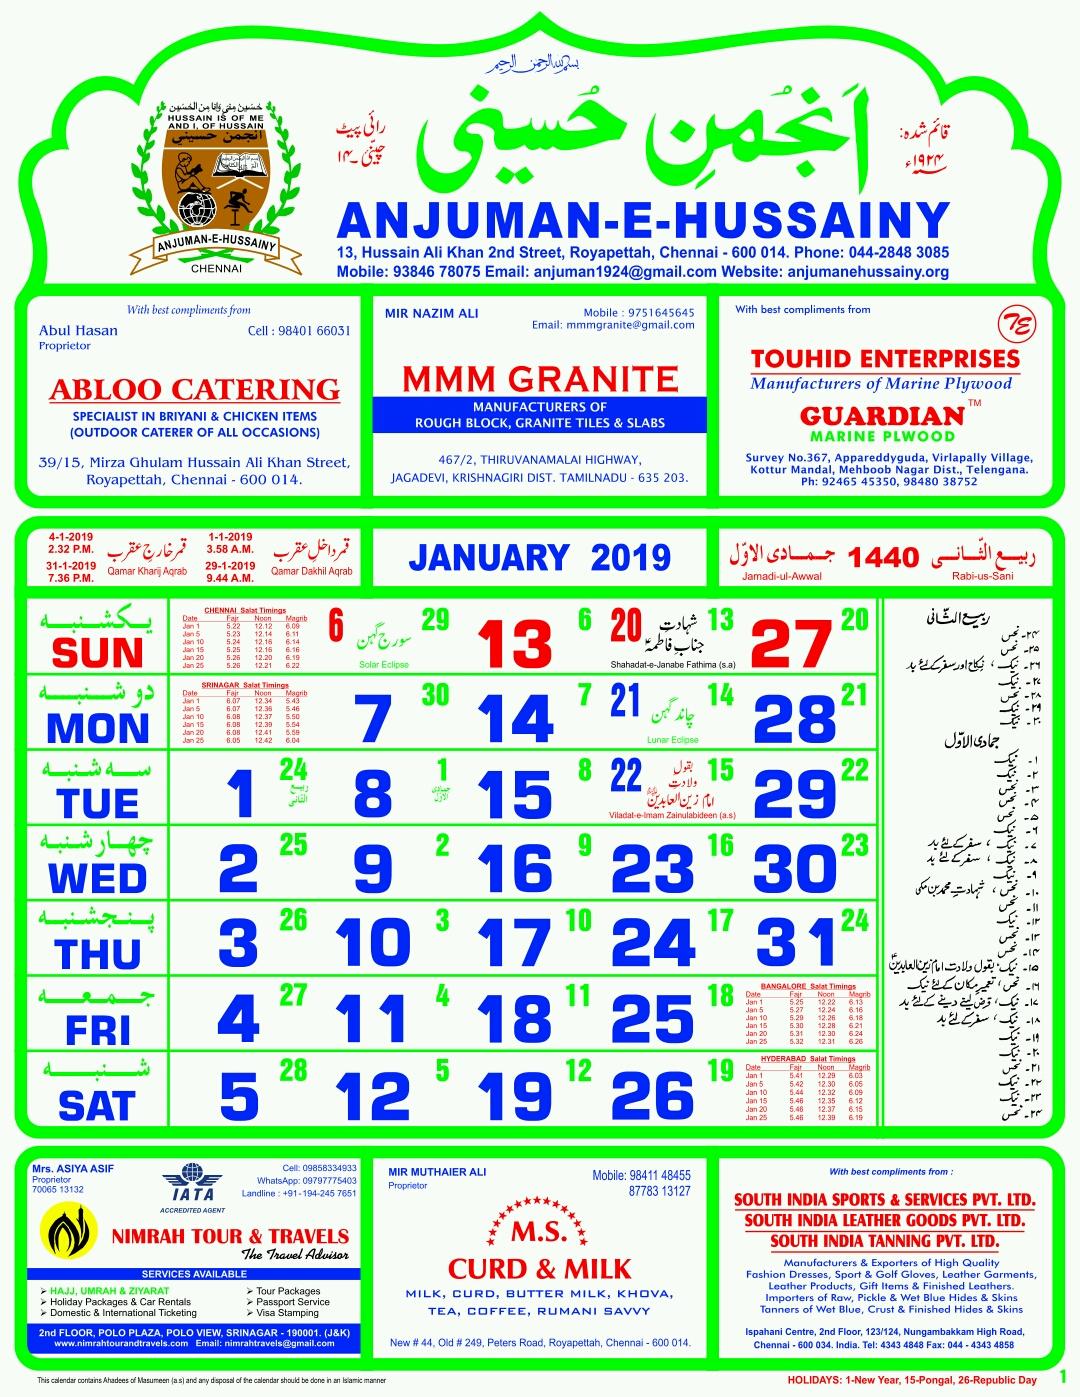 Zitechinformation: Anjuman E Hussainy Calendar 2019 - Shia